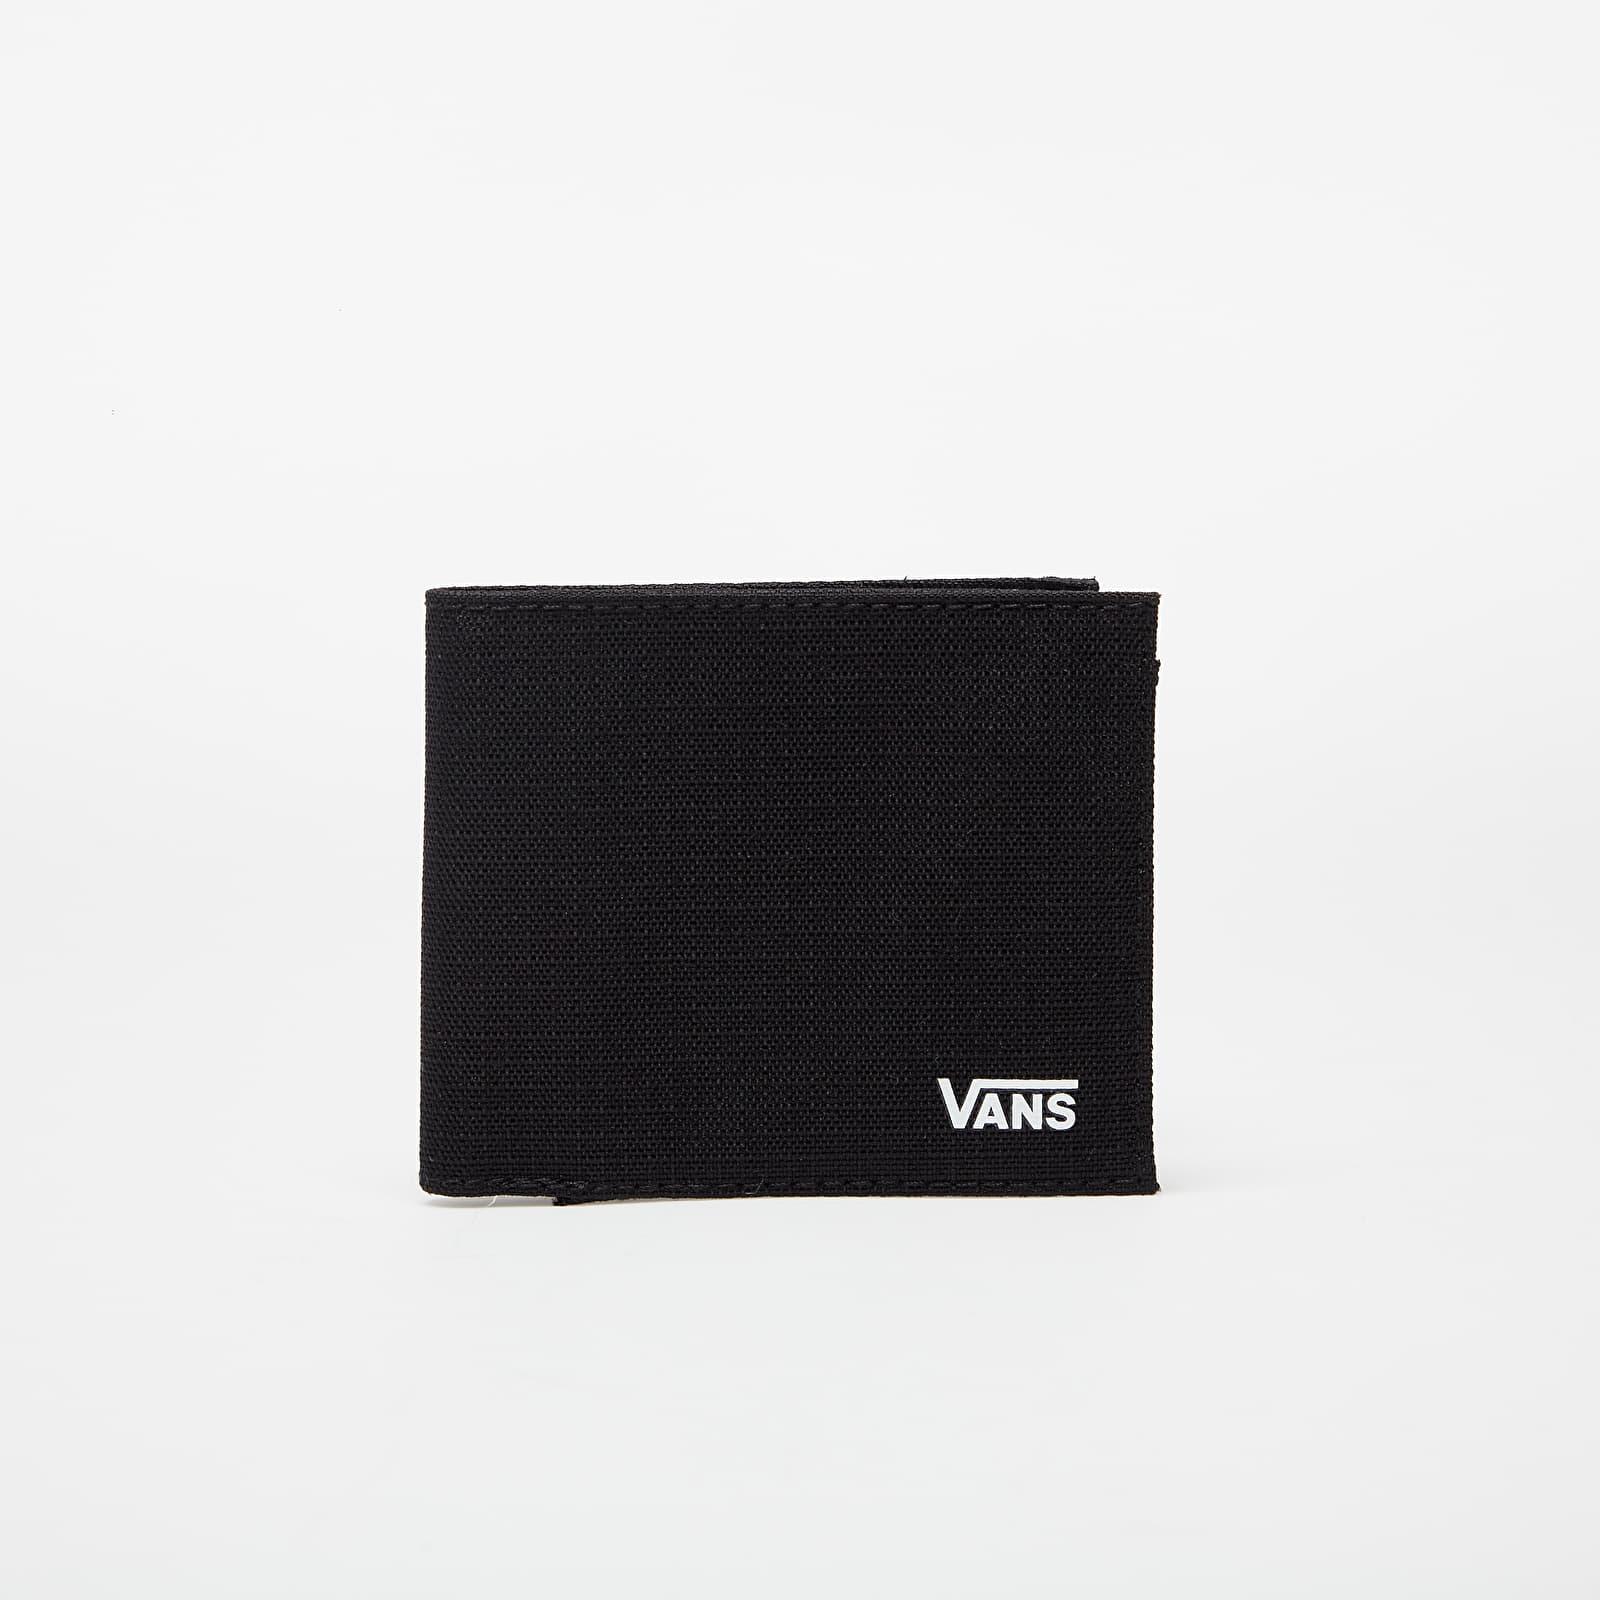 Vans Ultra Thin Wallet Black/White | Footshop